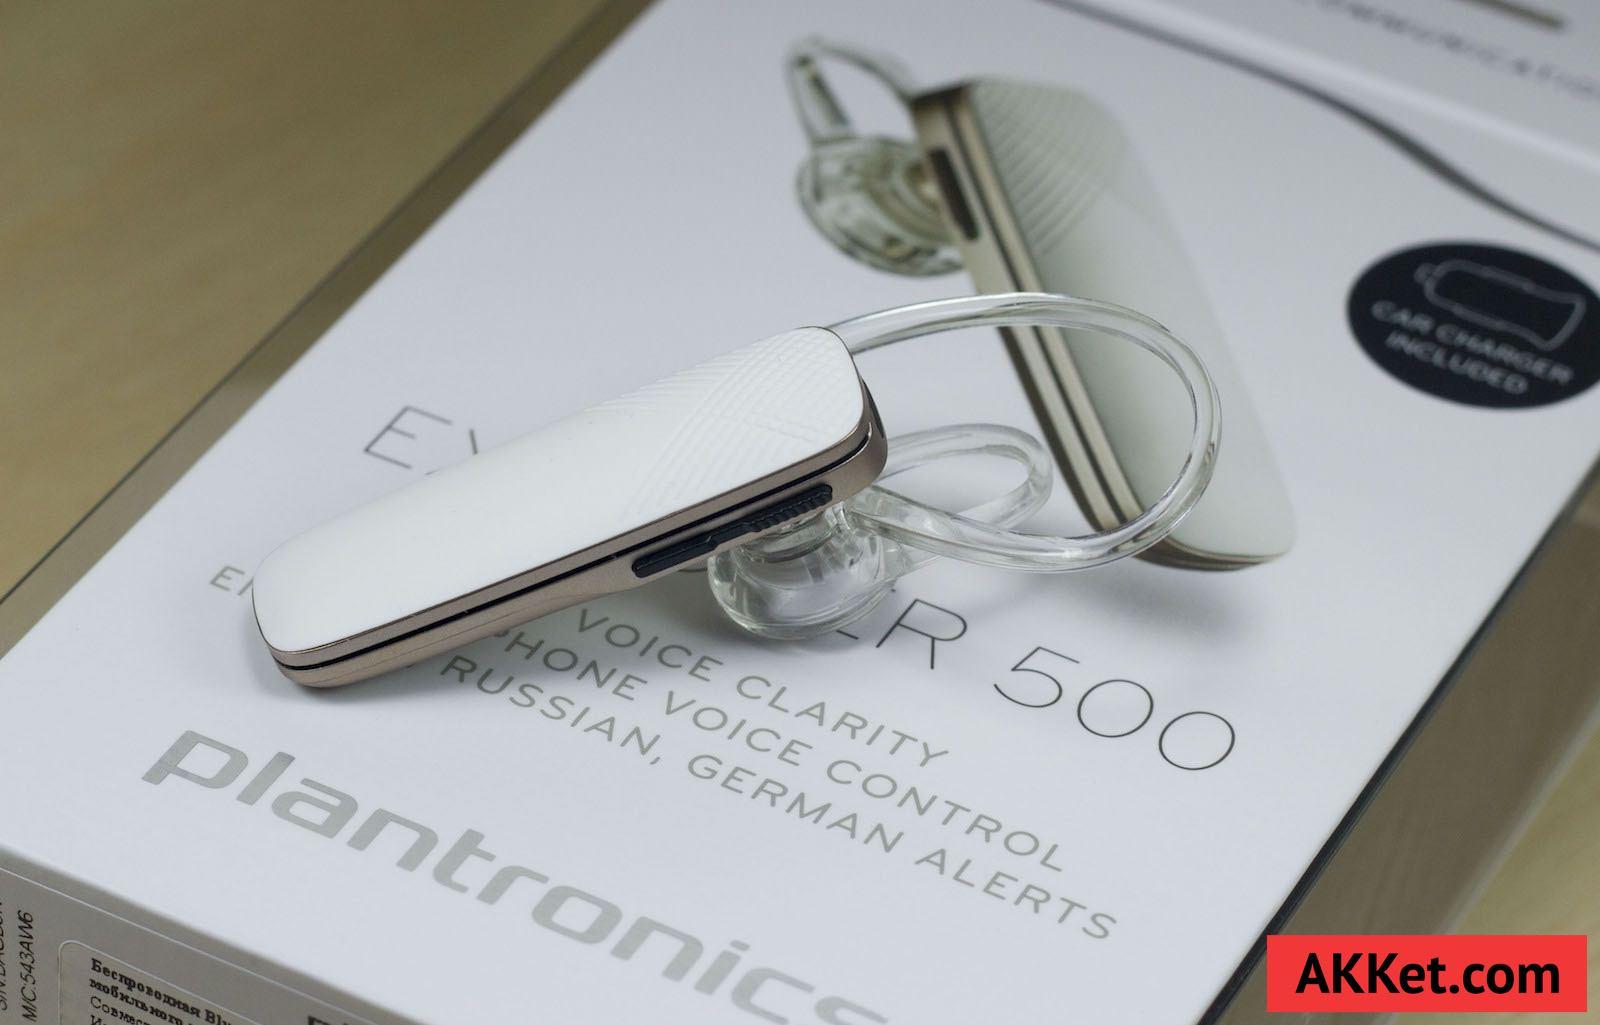 Plantronics Explorer 500 25